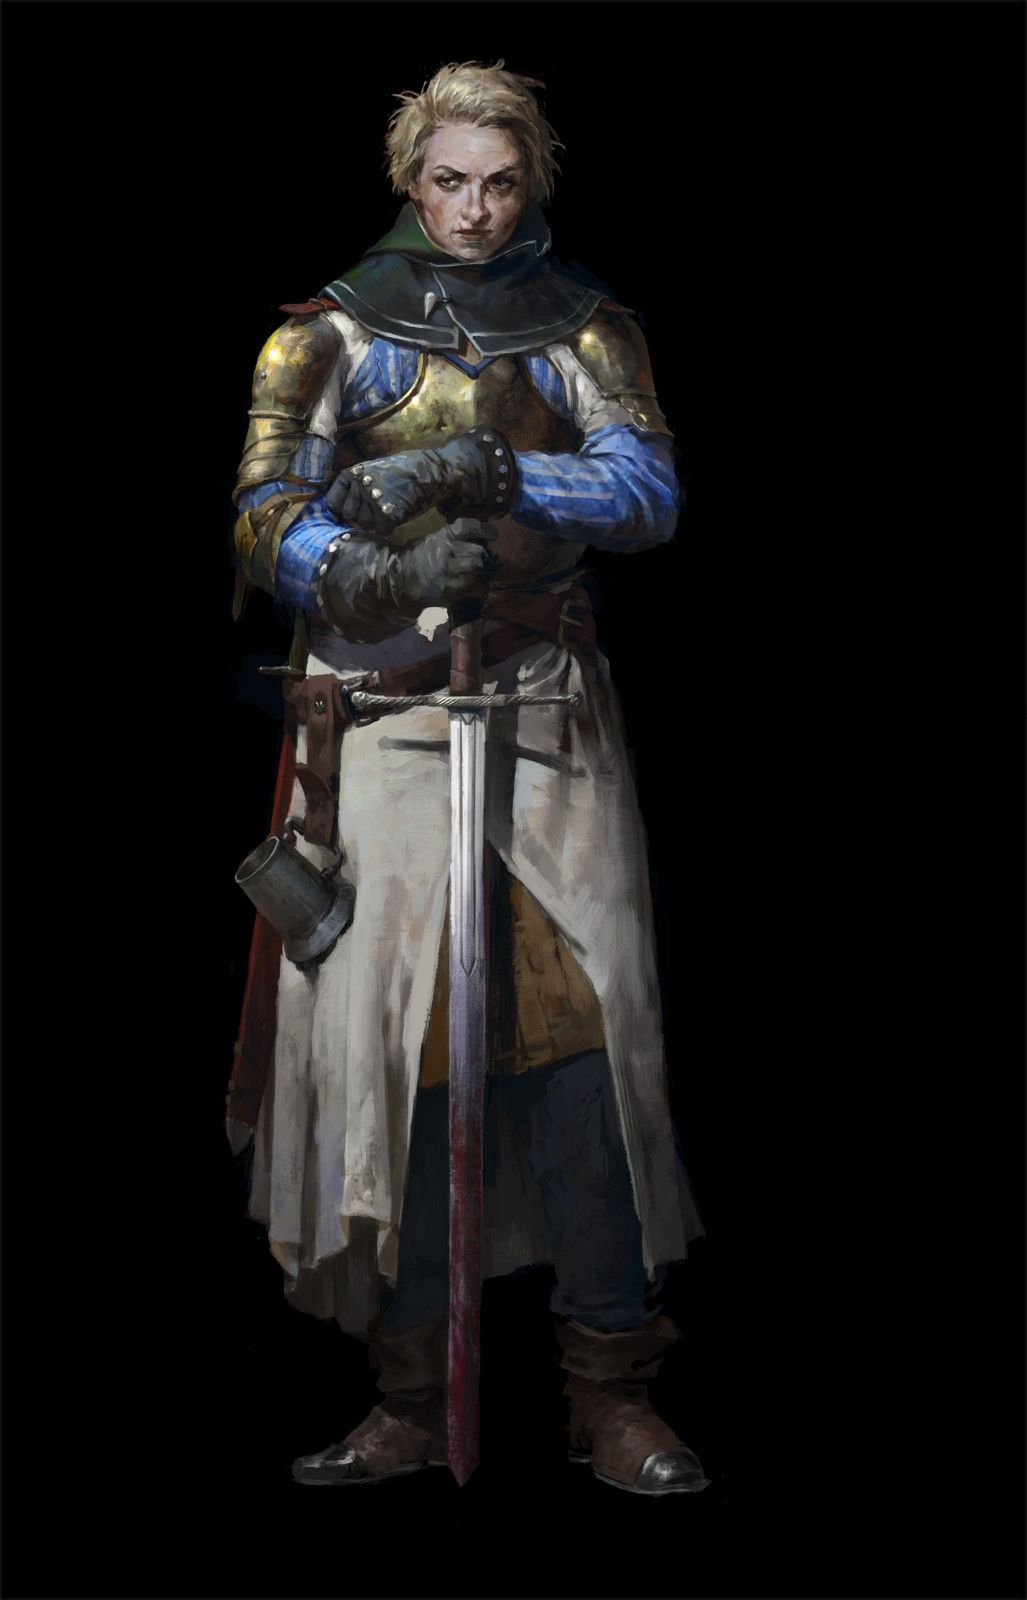 Knight, cg_ sister on ArtStation at https://www.artstation.com/artwork/e34lJ